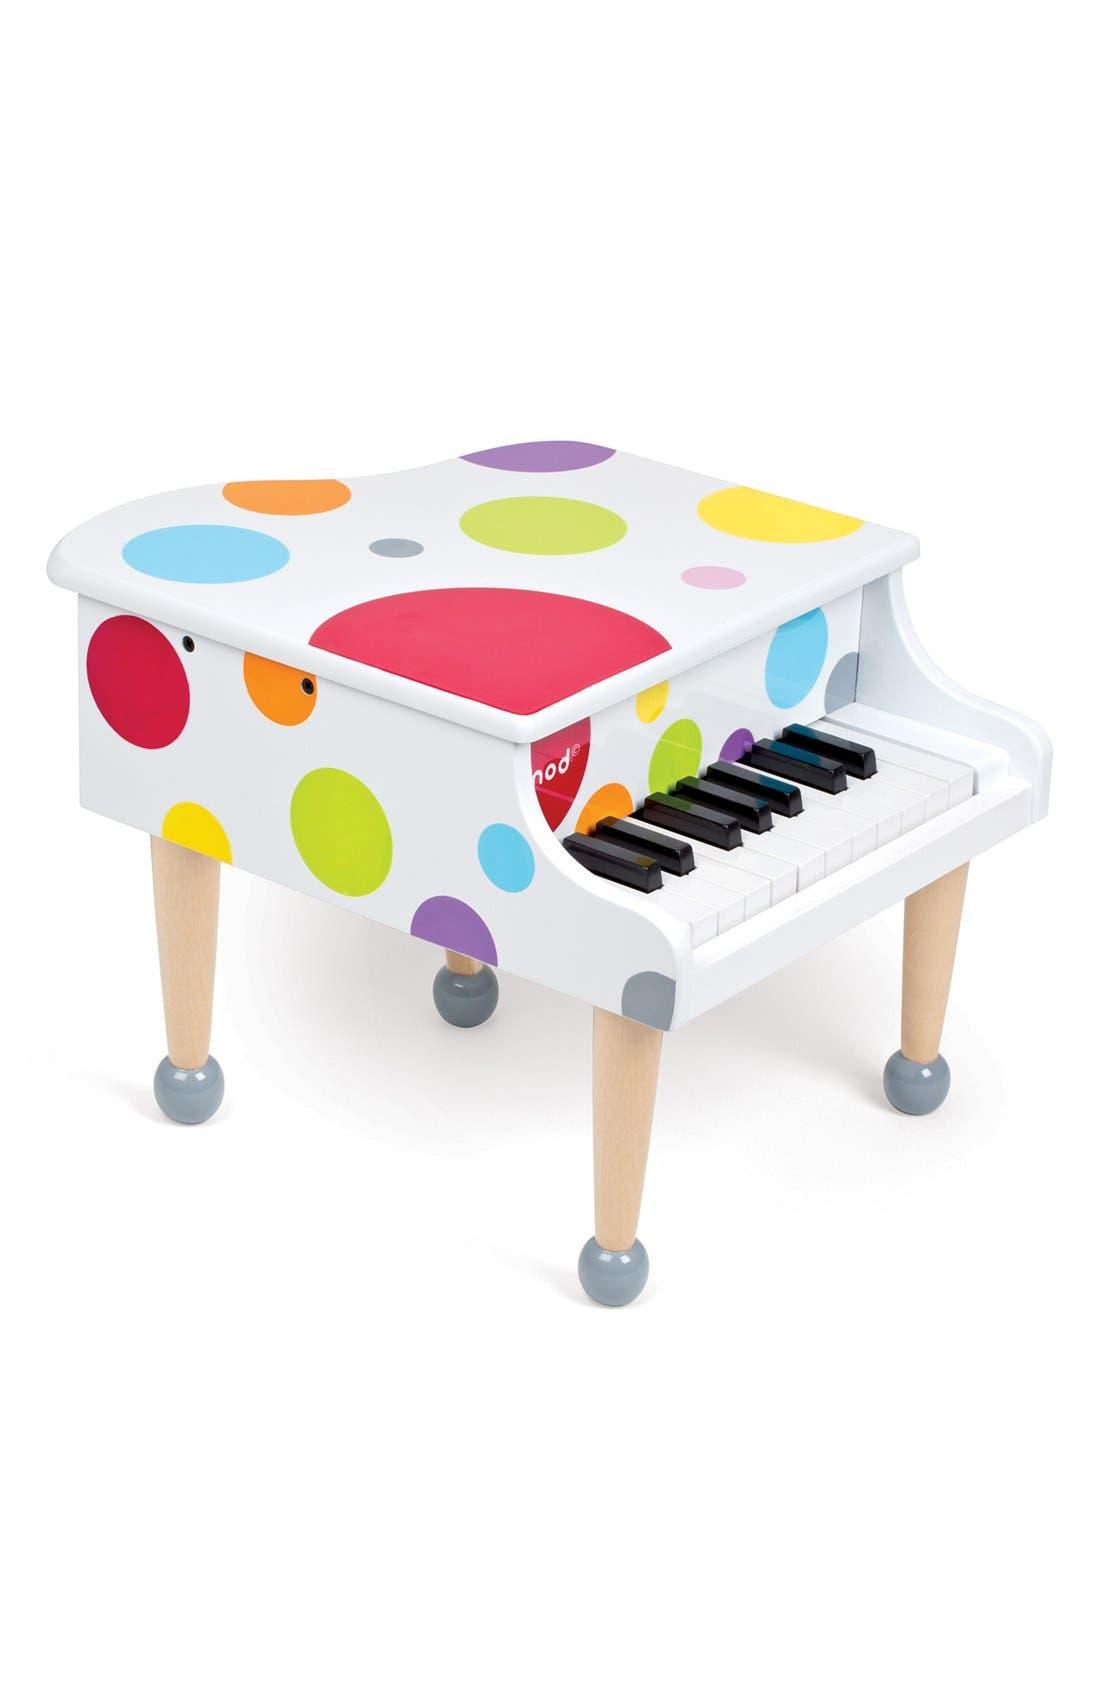 Main Image - Janod 'Confetti' Grand Piano Play Set